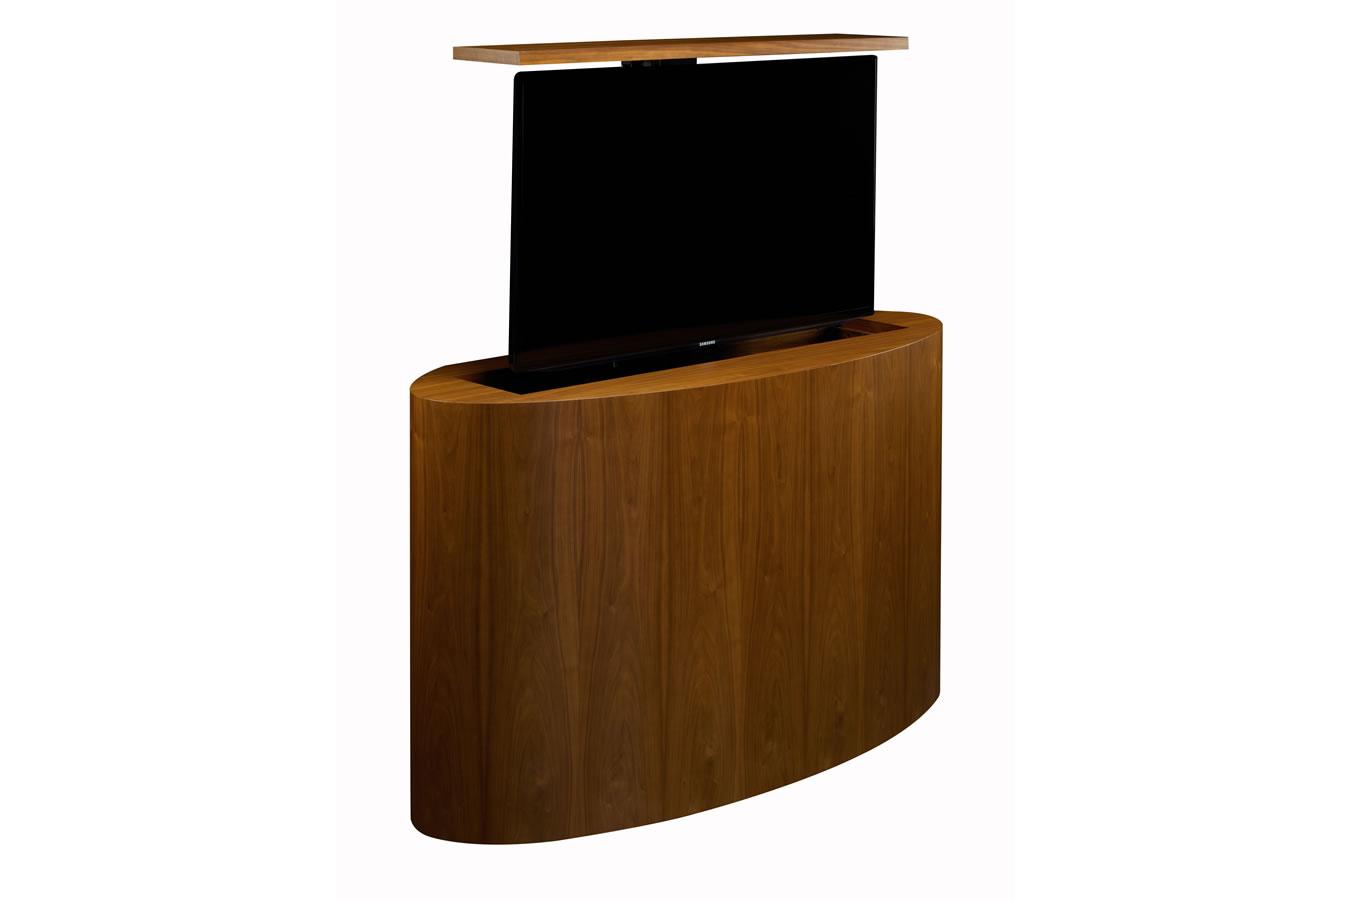 malibu rounded modern tv lift furniture cabinet tronix. Black Bedroom Furniture Sets. Home Design Ideas